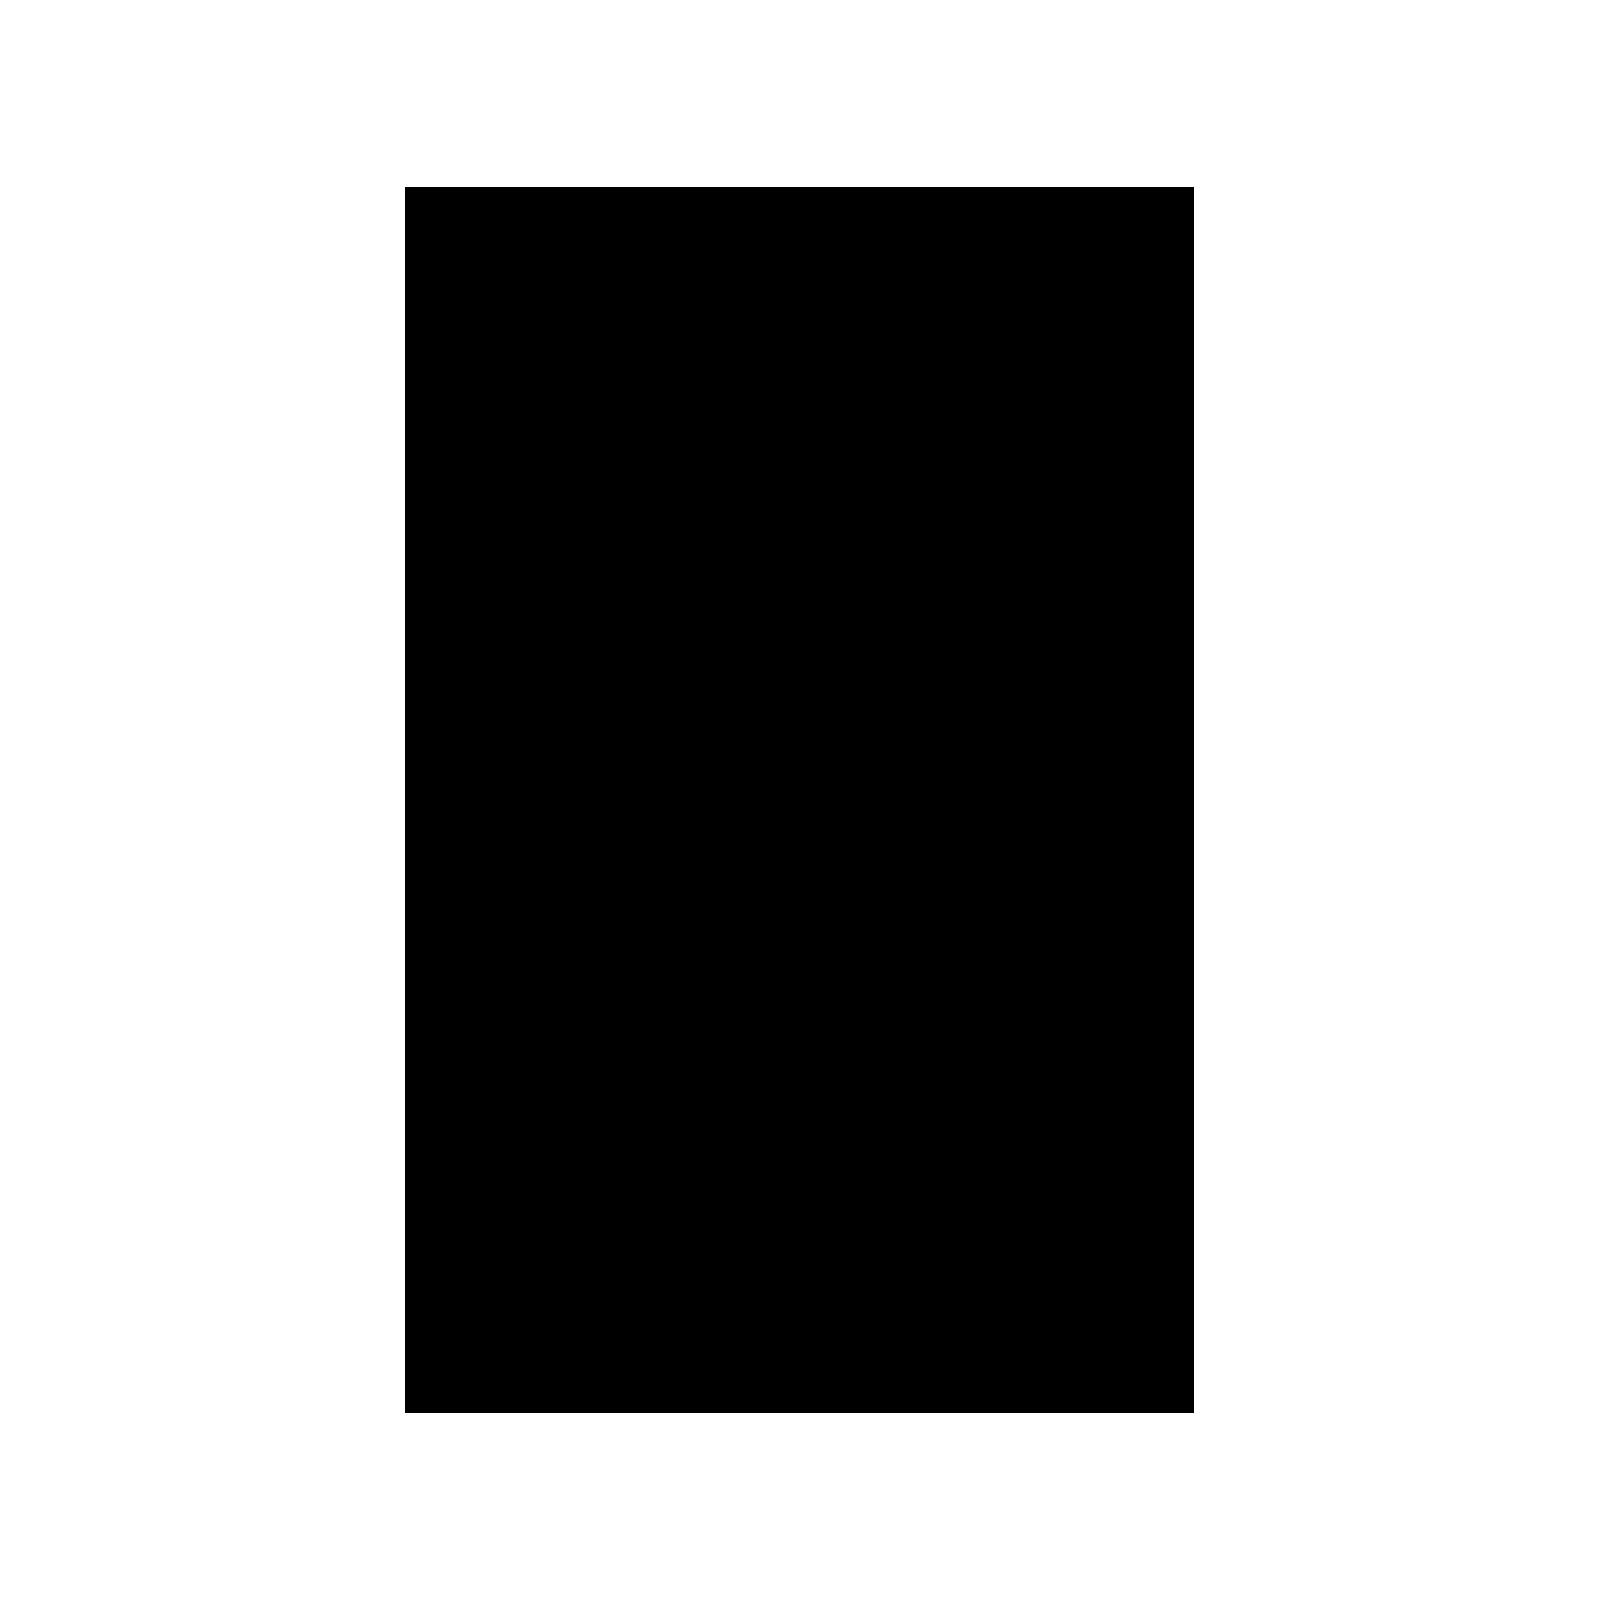 Gruppo vasca con deviatore e kit doccia